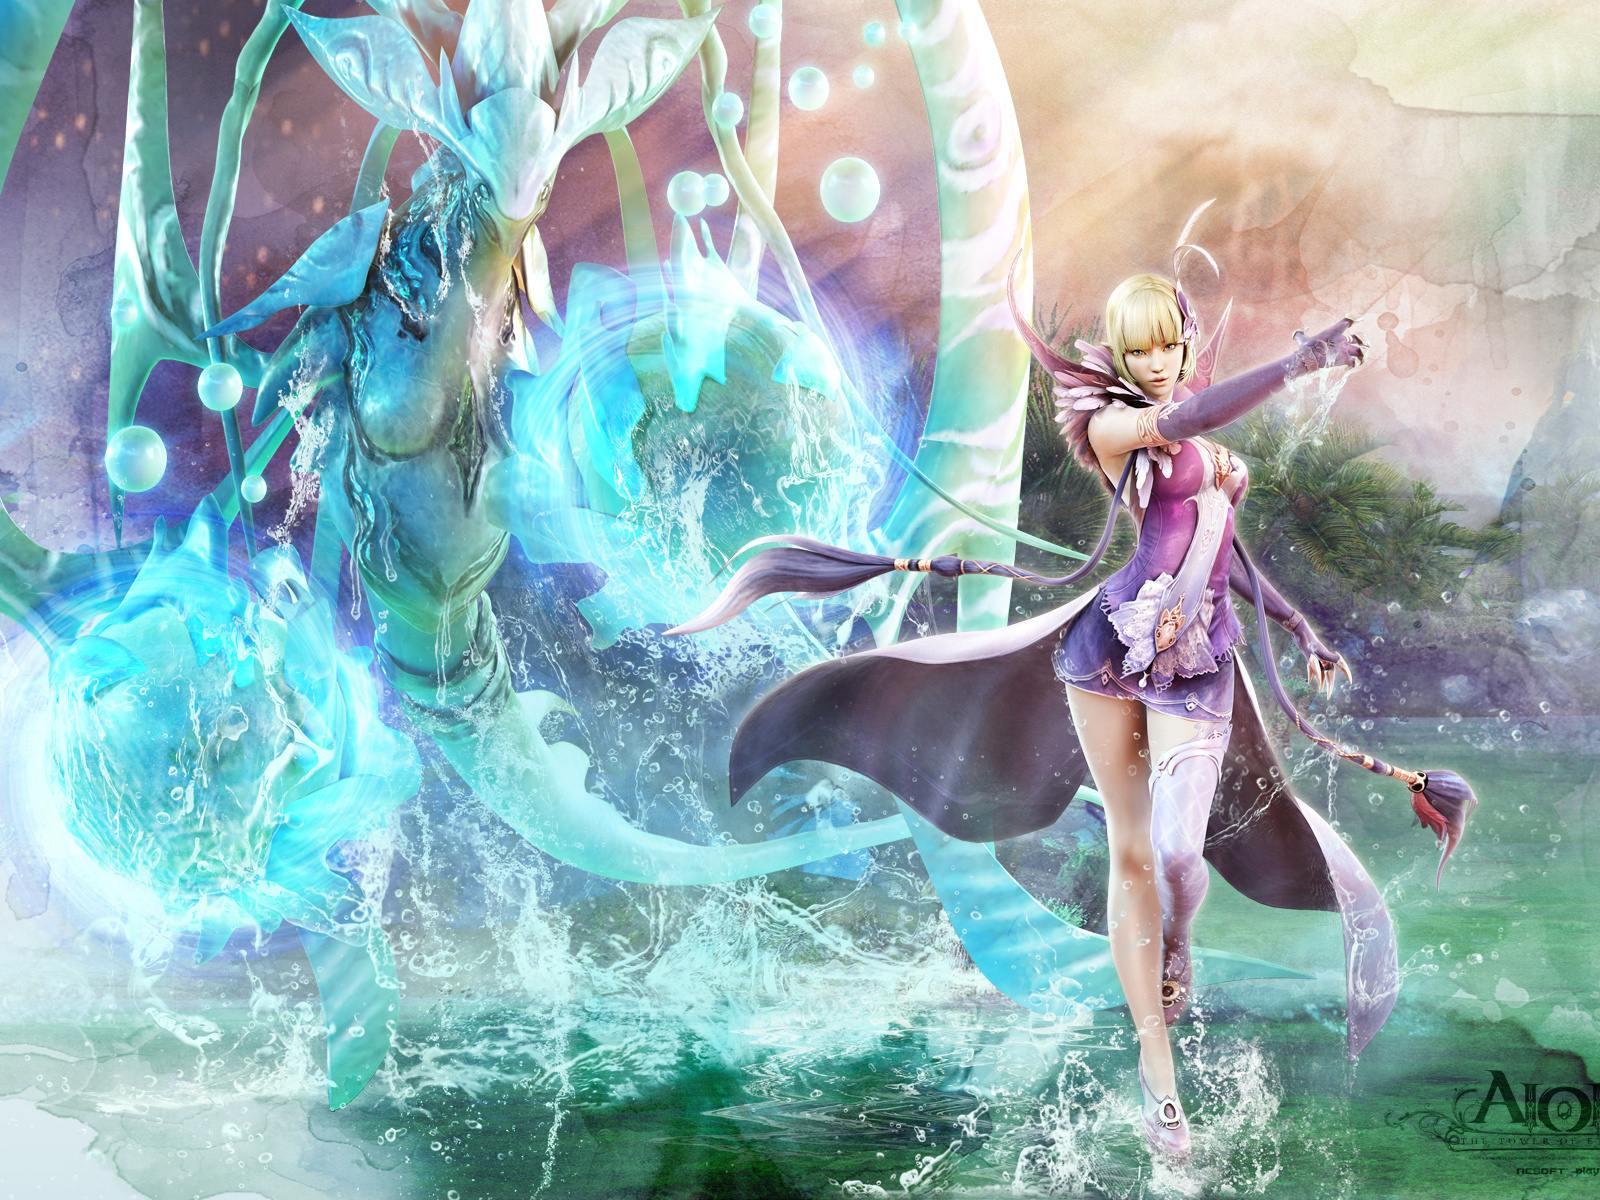 обои Девушка, персонаж, игра, магия картинки фото